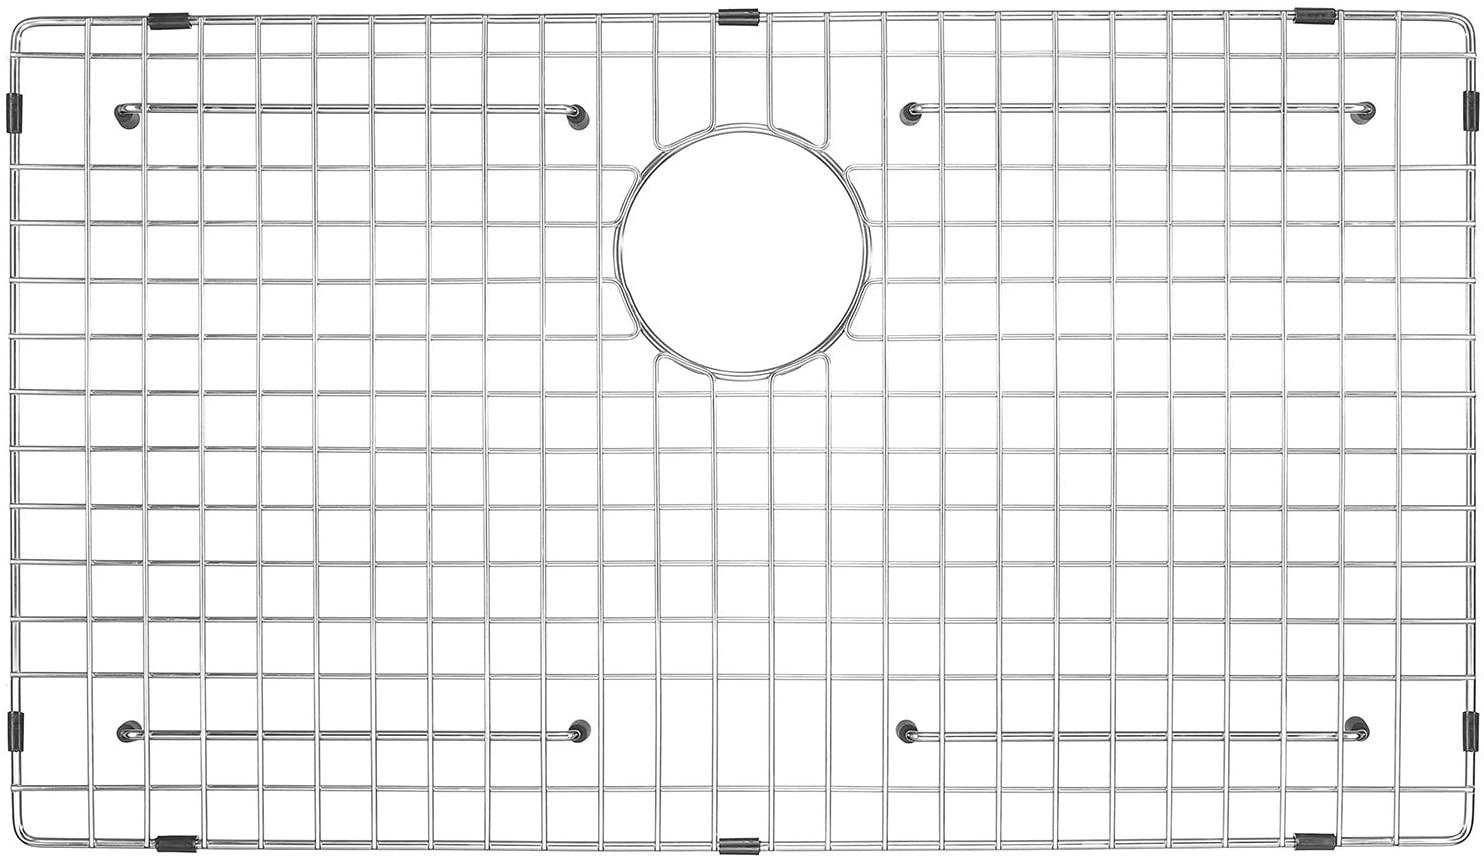 "Serene Valley Sink Bottom Grid and Kitchen Sink Protector NDG3021, 304 Premium Stainless Steel, dim 26 3/4"" x 15 11/16"""